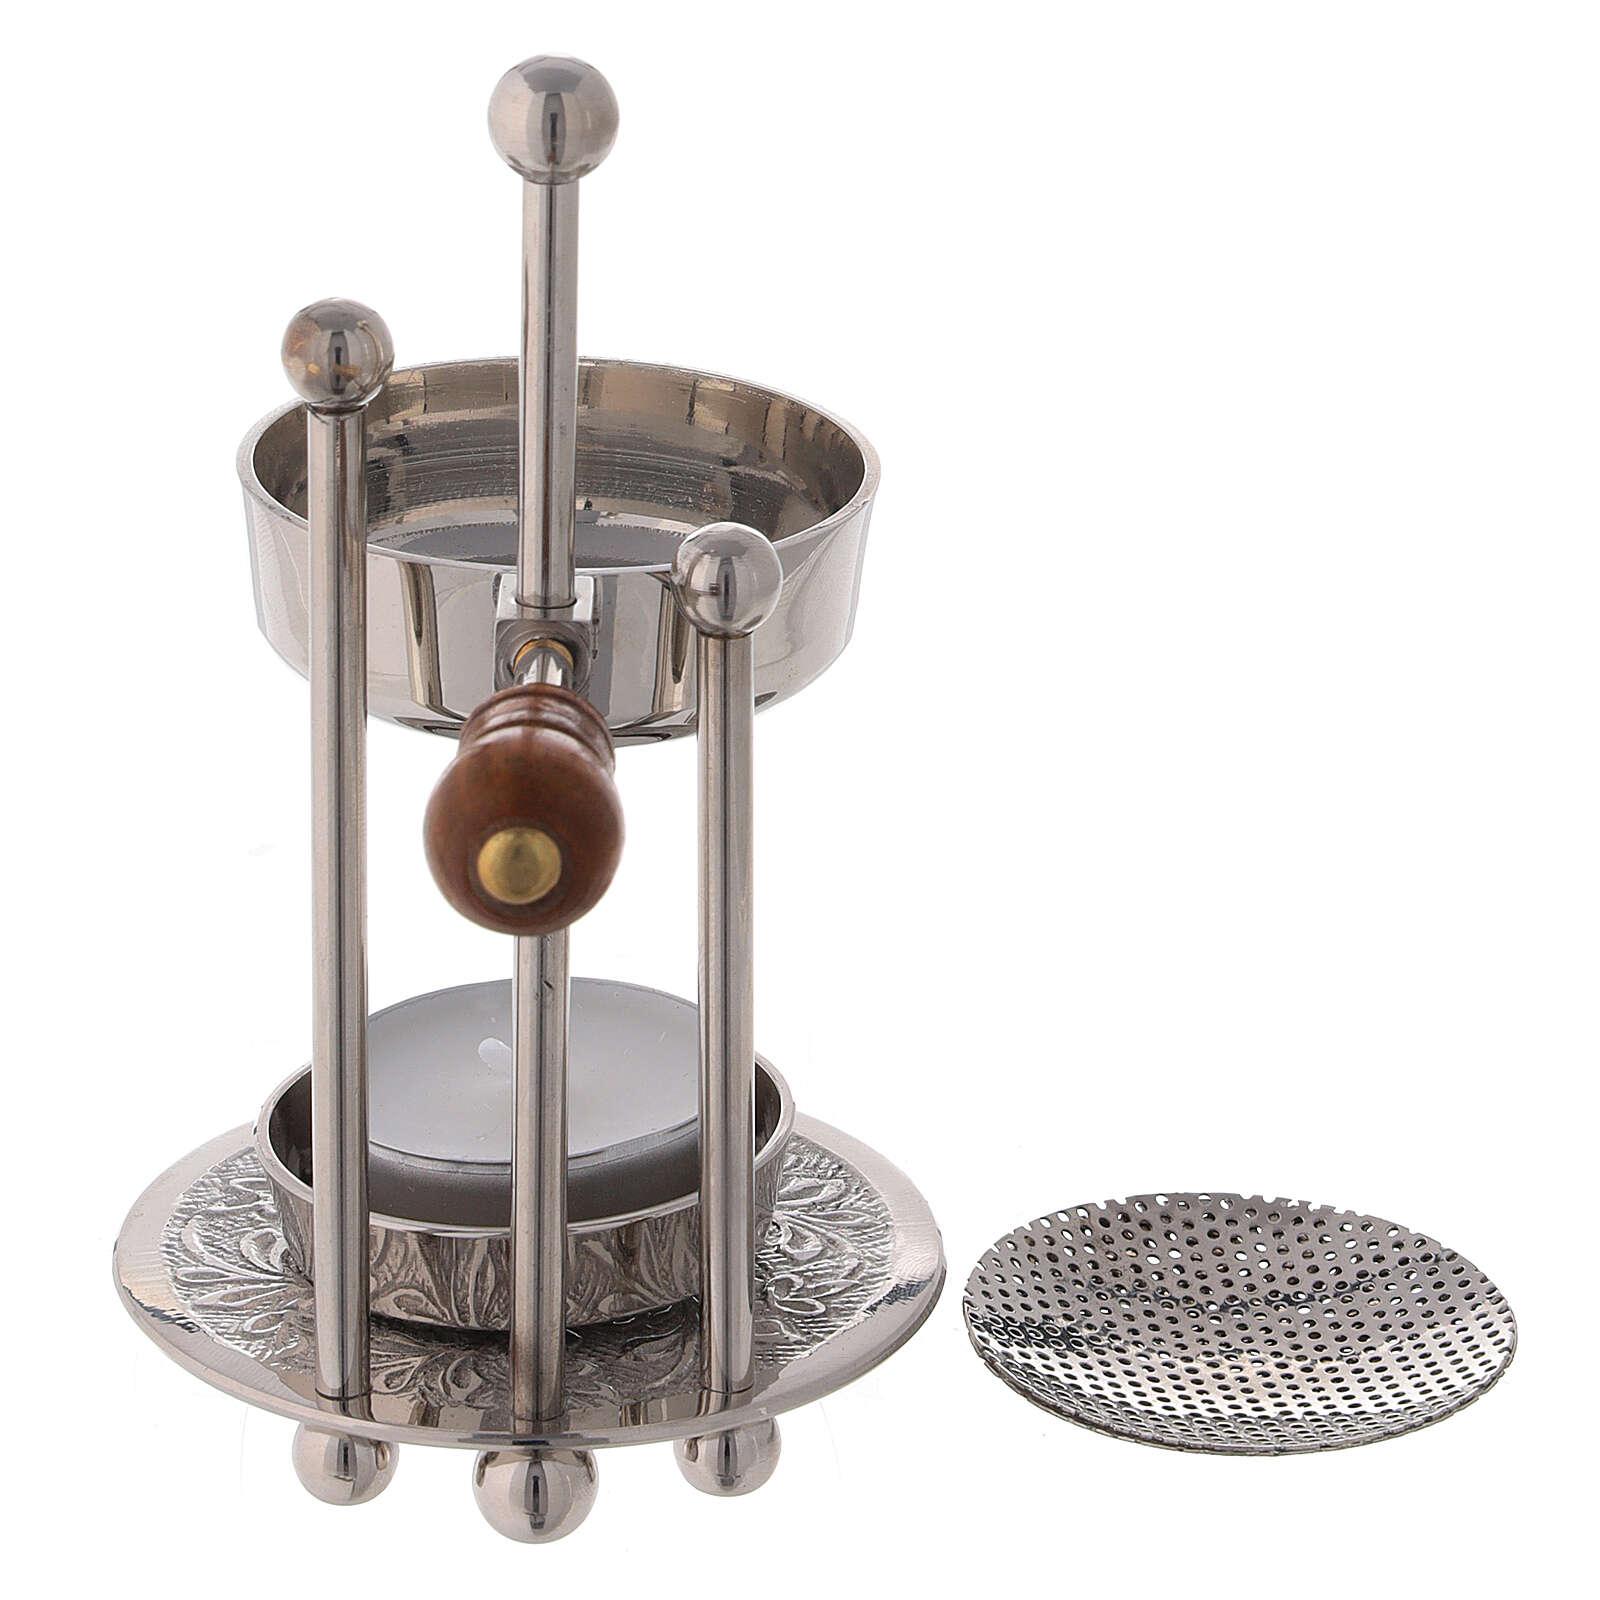 Height-adjustable incense burner 5 in three columns wood handle 3